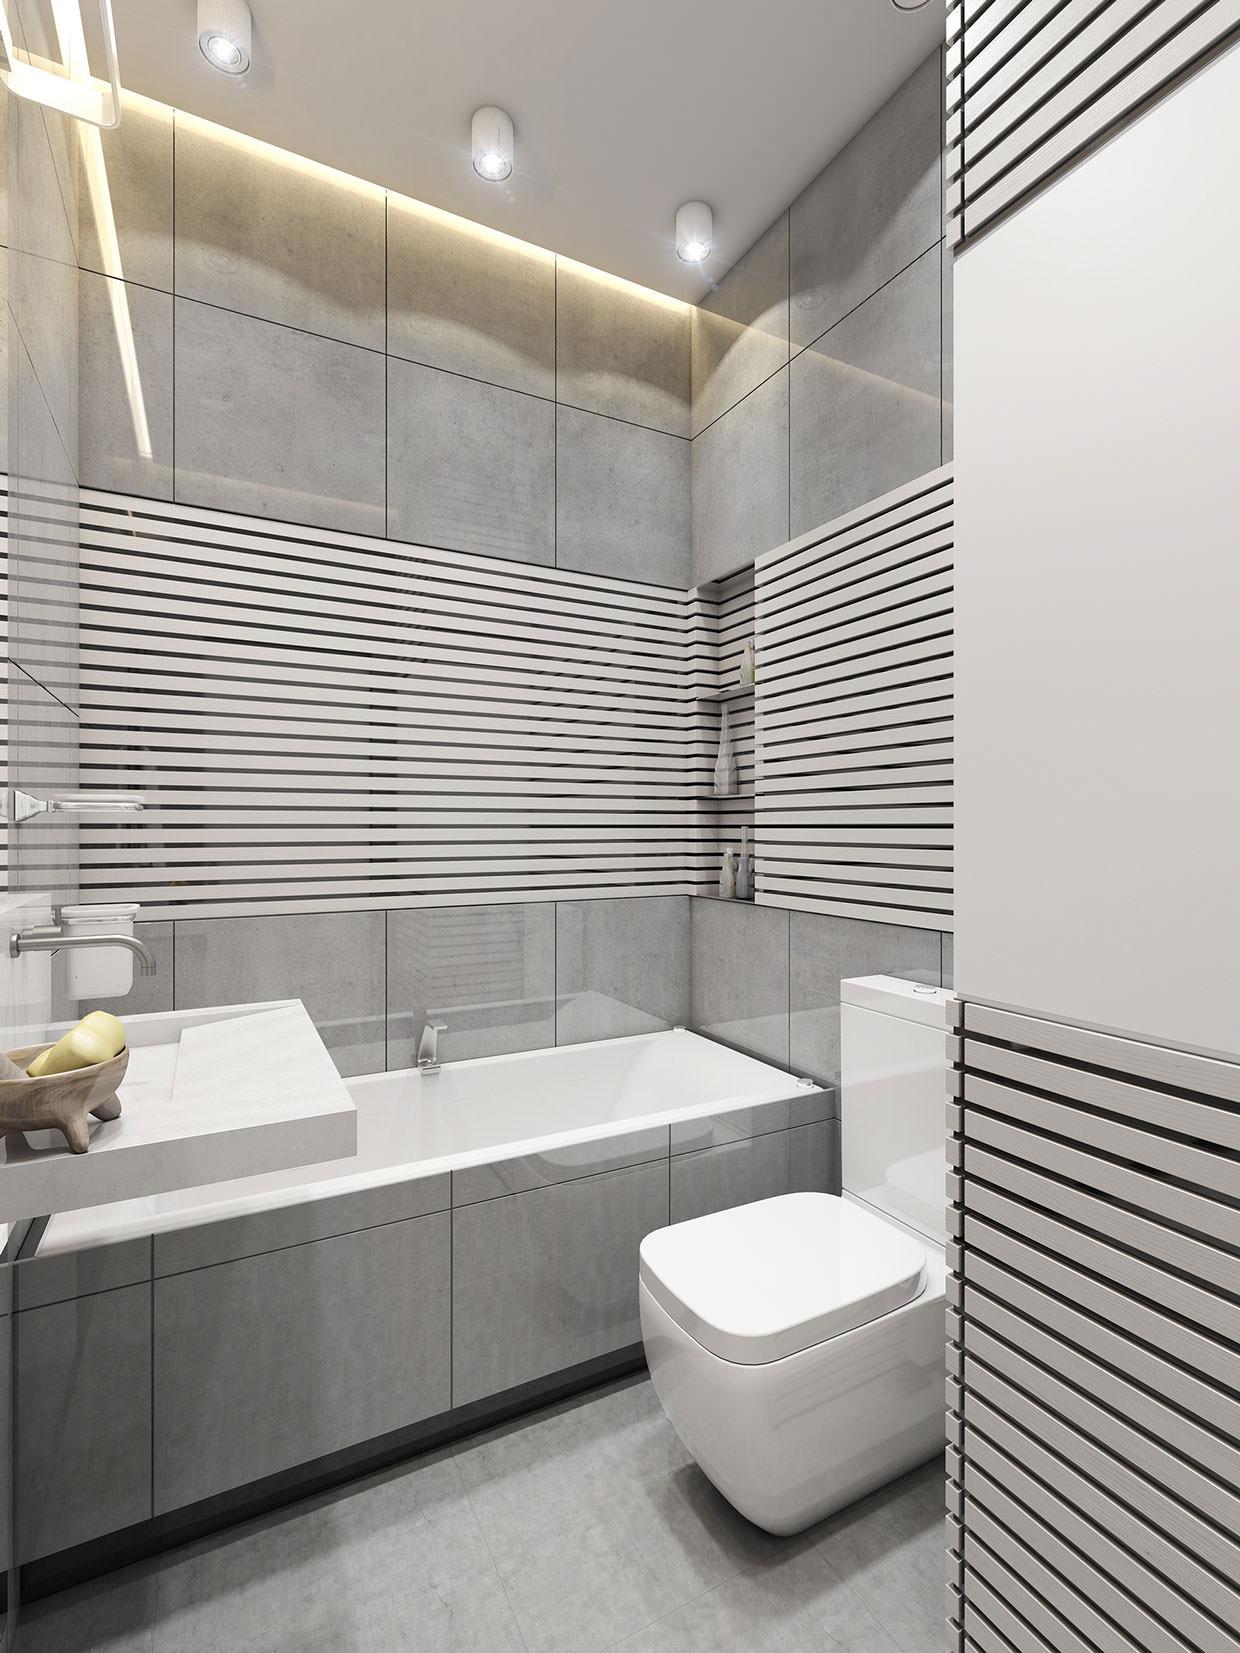 seraya plitka v vannoj razmery cvetovye ottenki i idei dizajna 7 - Идеи для ремонта в маленькой ванной